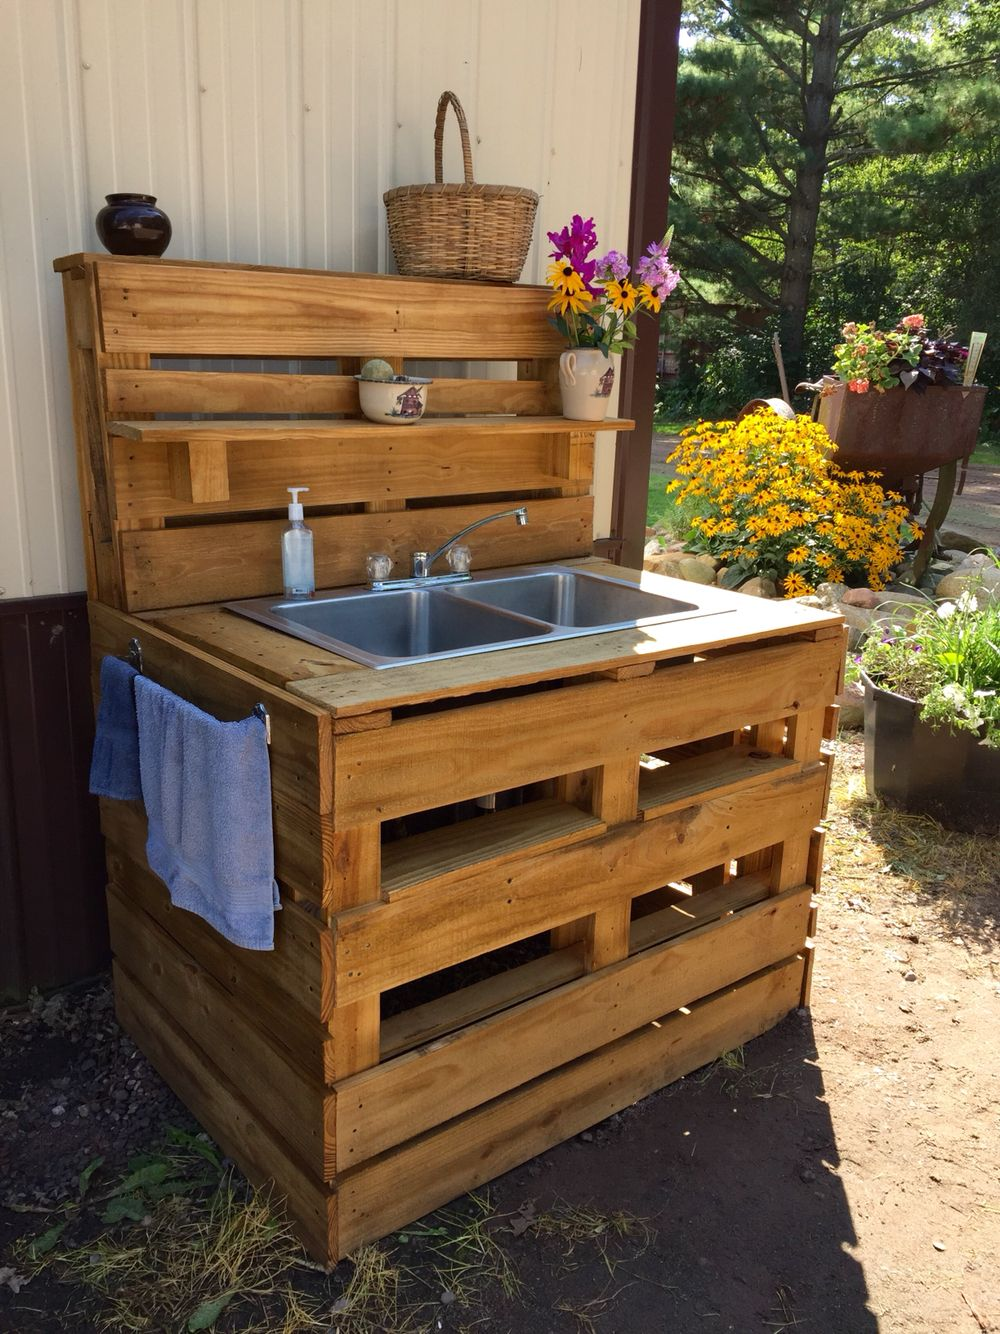 pallet sink diy outdoor kitchen outdoor sinks pallet diy on outdoor kitchen diy id=81078